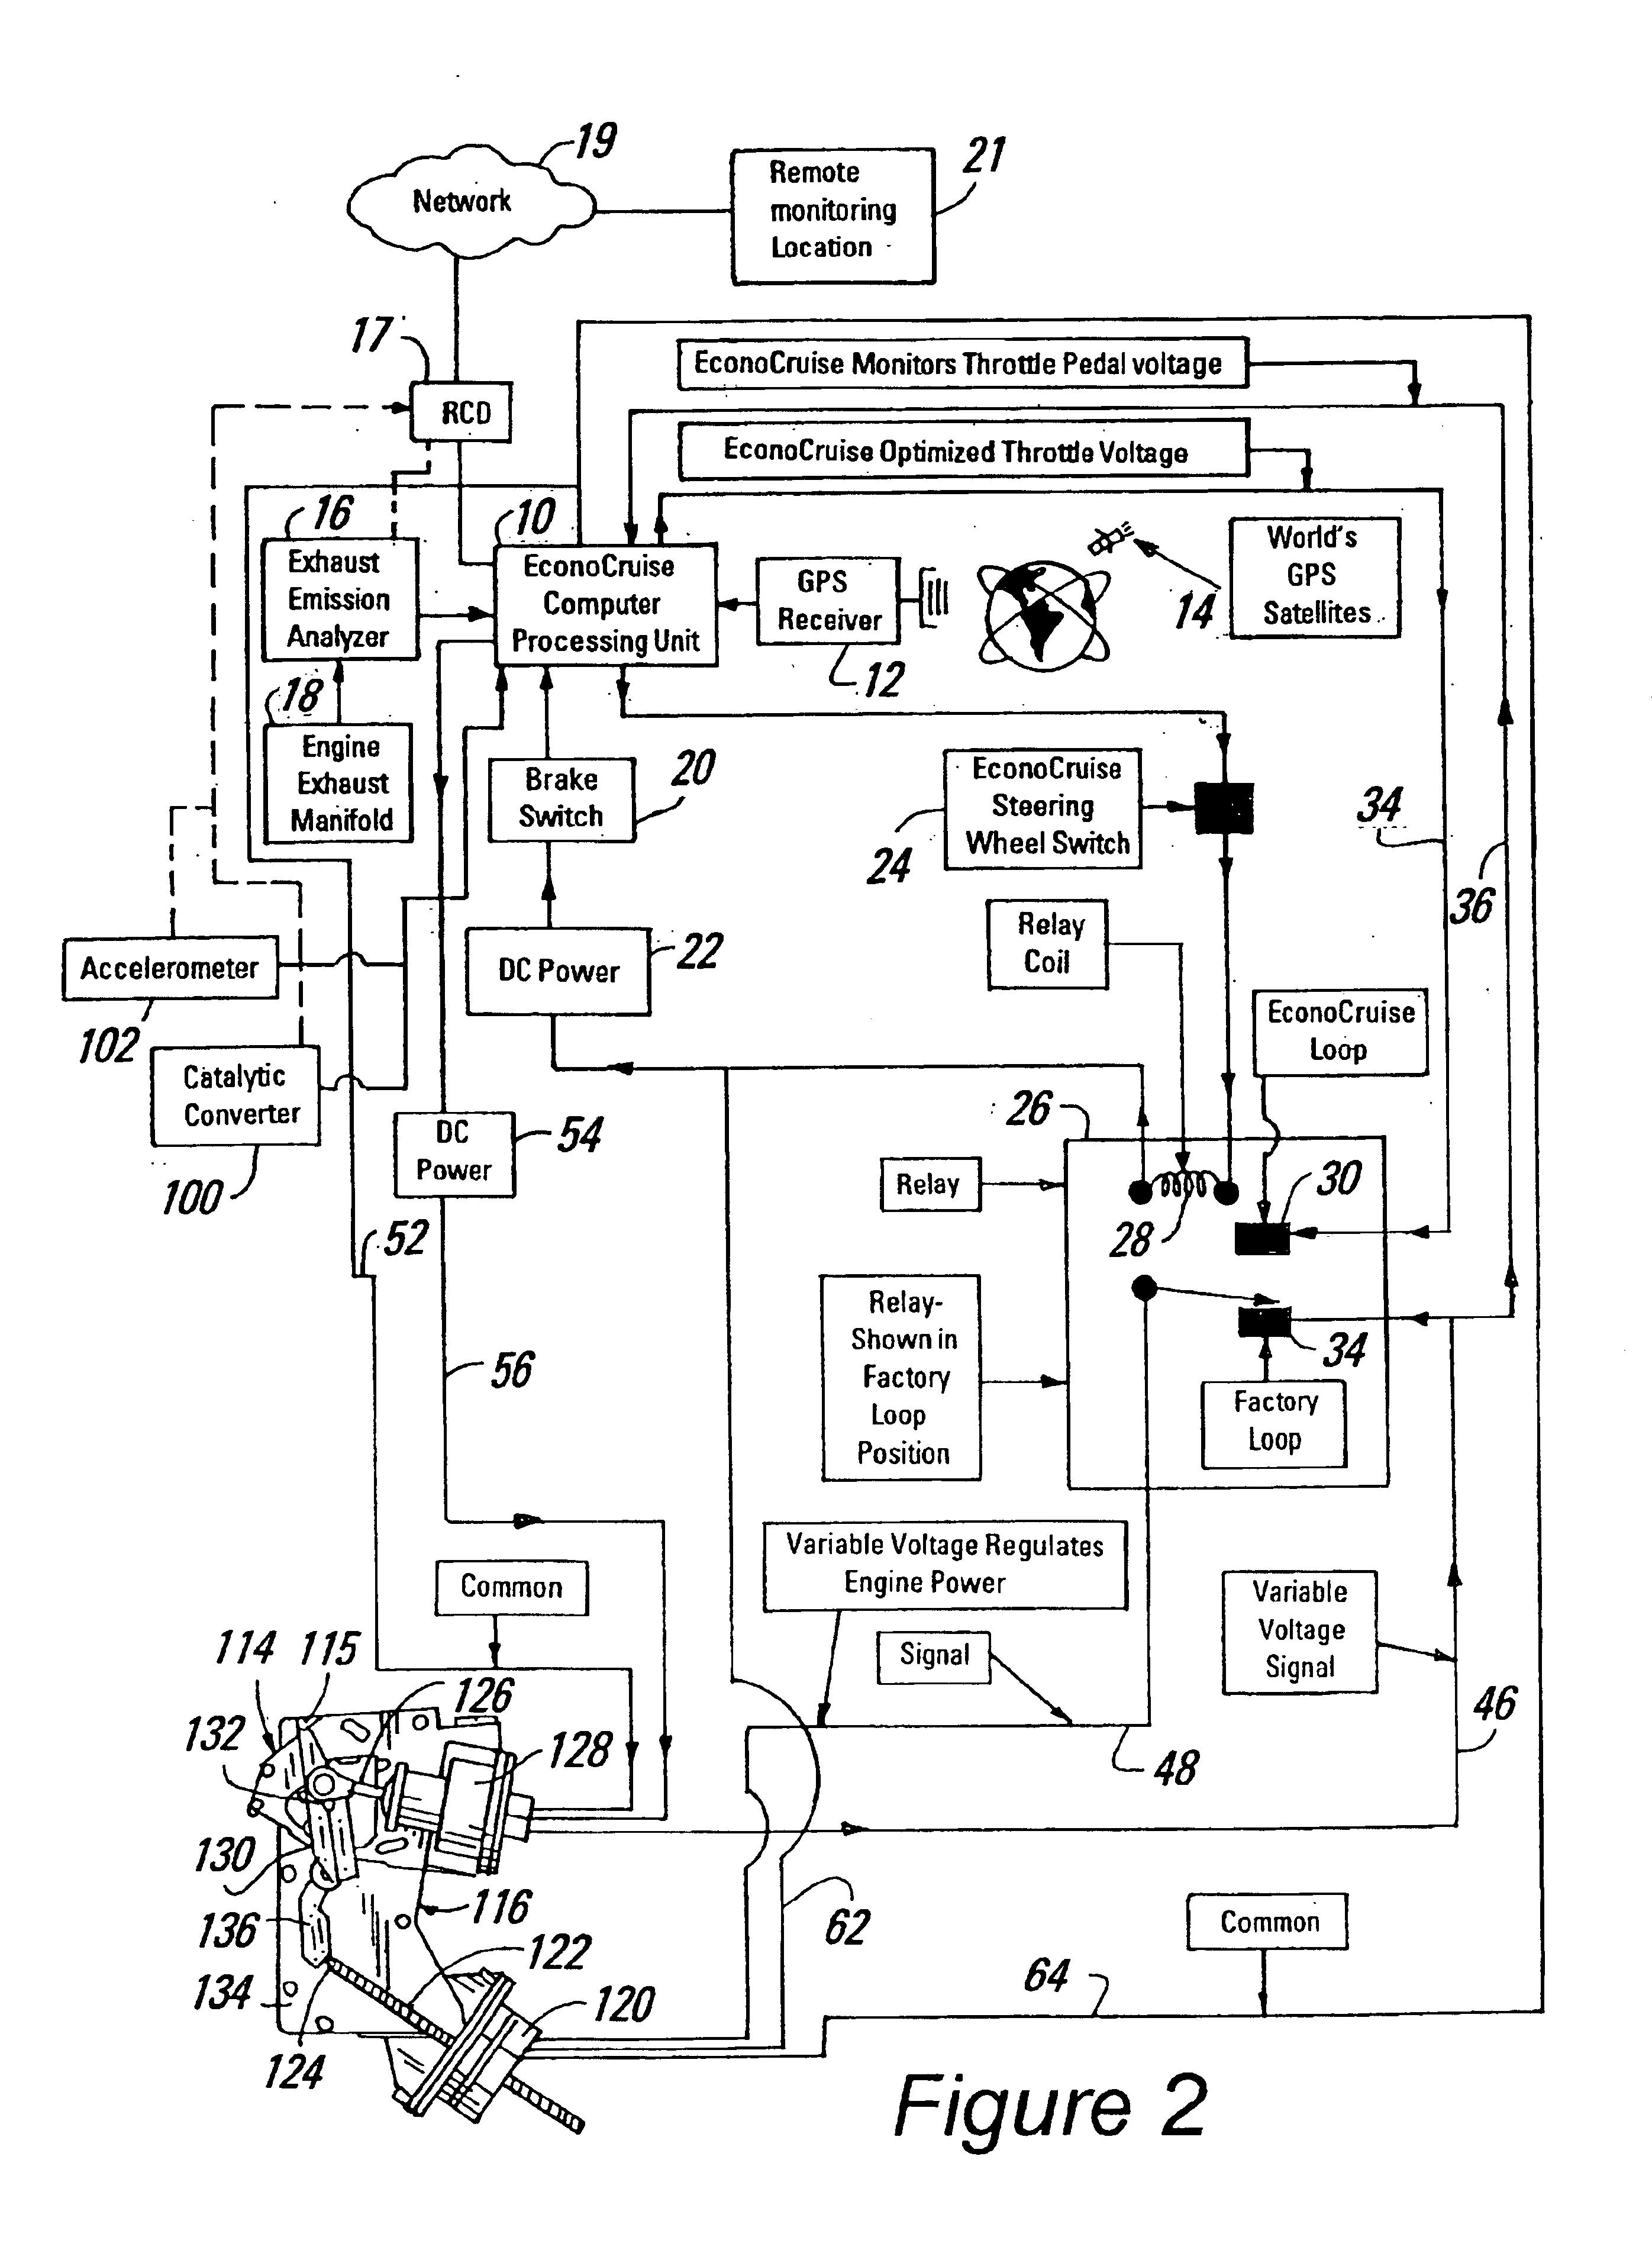 [SCHEMATICS_4CA]  CG_8656] International 4700 Ignition Diagram Free Diagram | 2001 4700 International Engine Diagram |  | Bocep Otene Impa Arnes Hapolo Mohammedshrine Librar Wiring 101